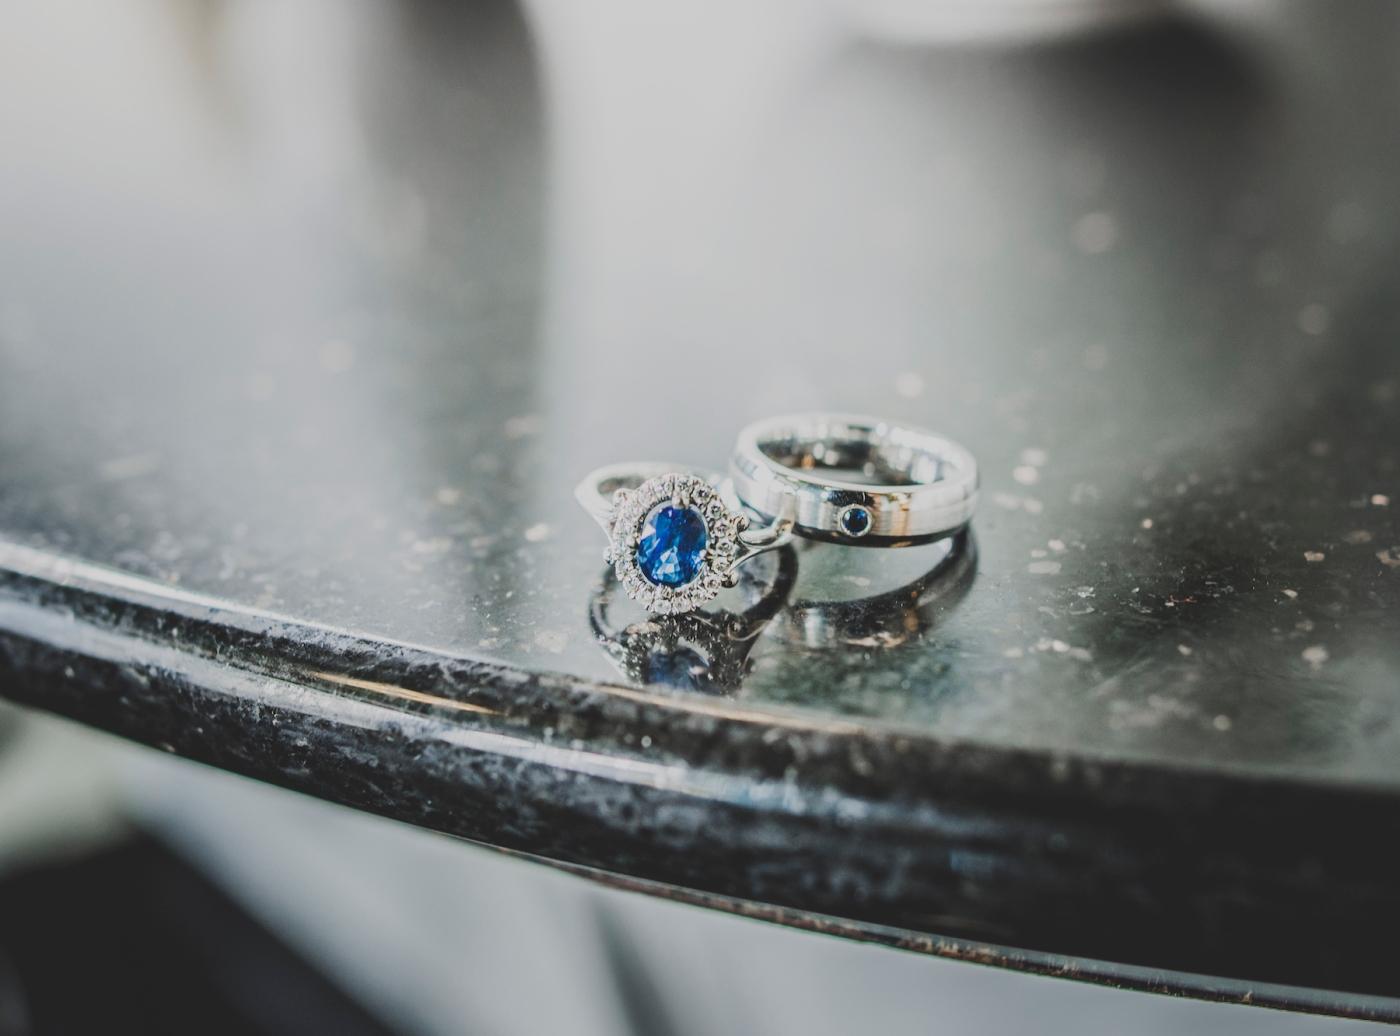 DSC_2375Everett_Wedding_Ballroom_Jane_Speleers_photography_Rachel_and_Edmund_Details_2017